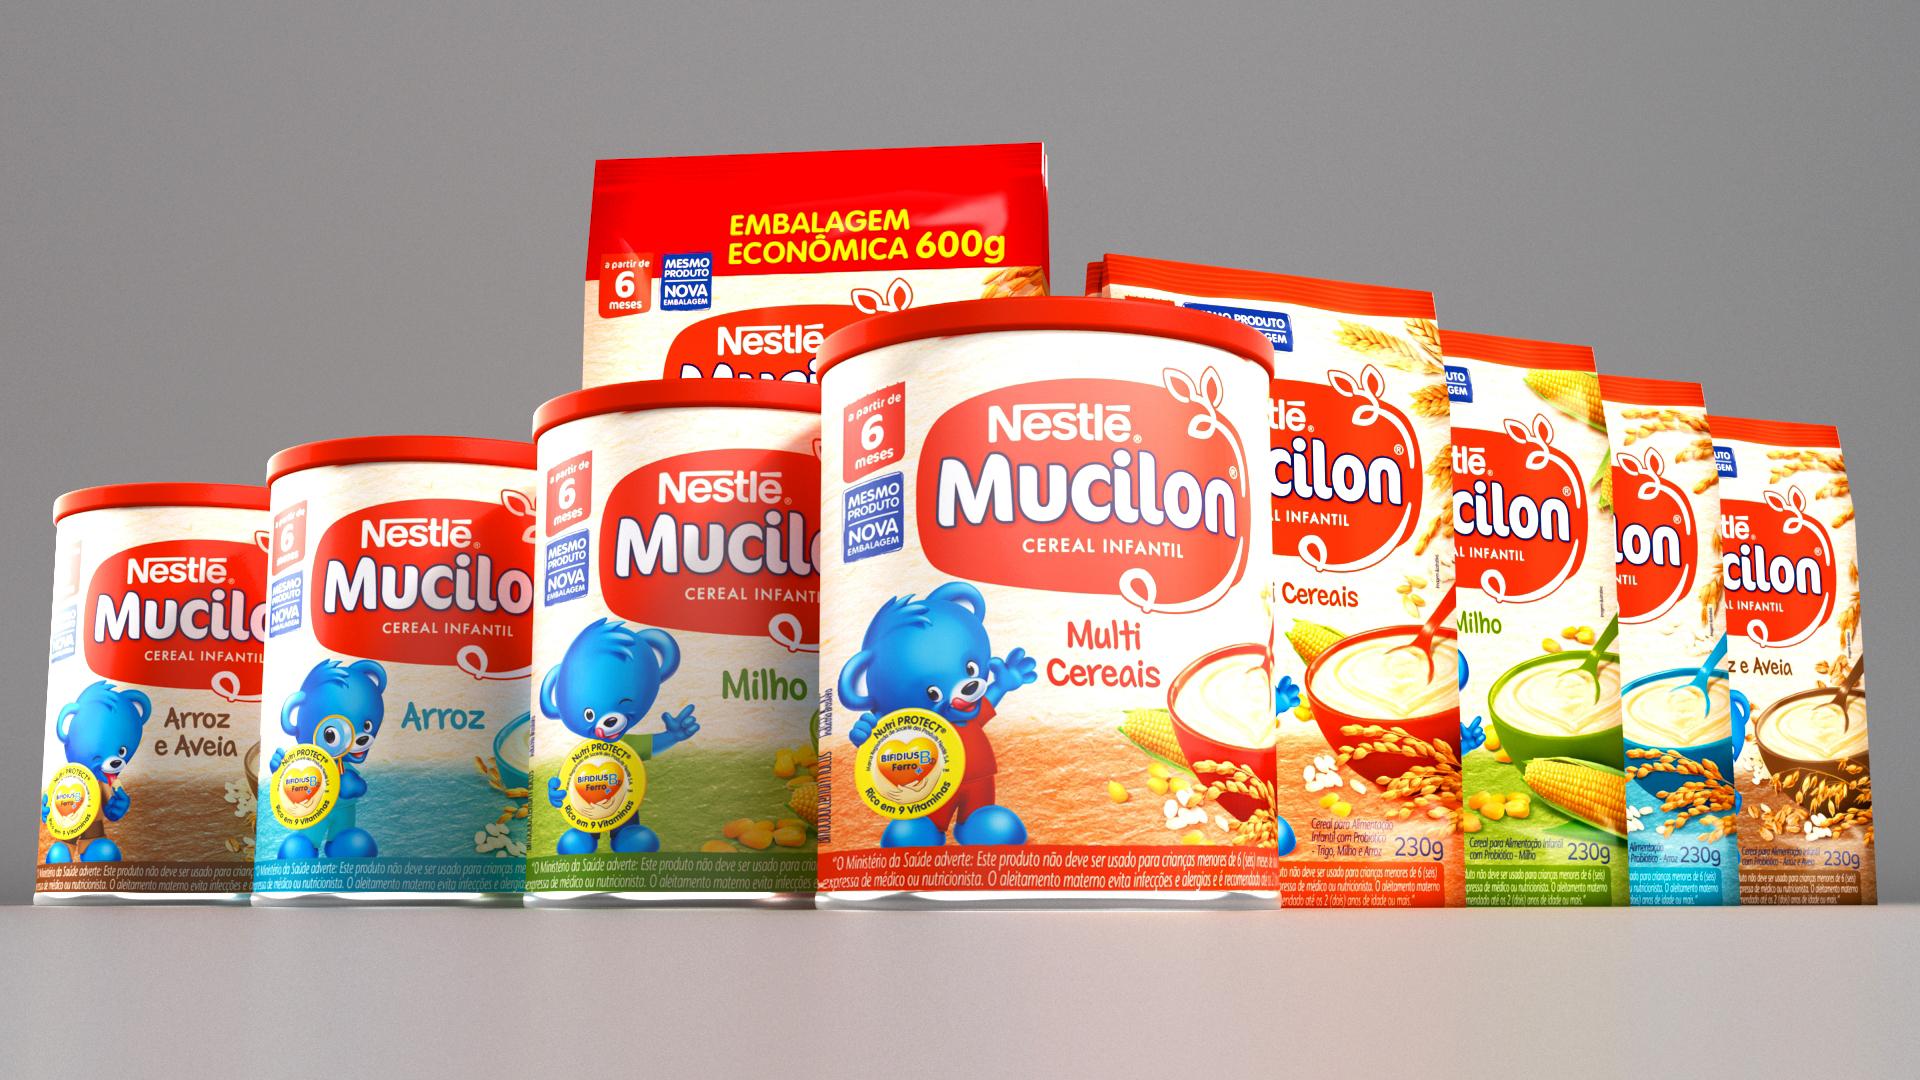 Mucilon Pack